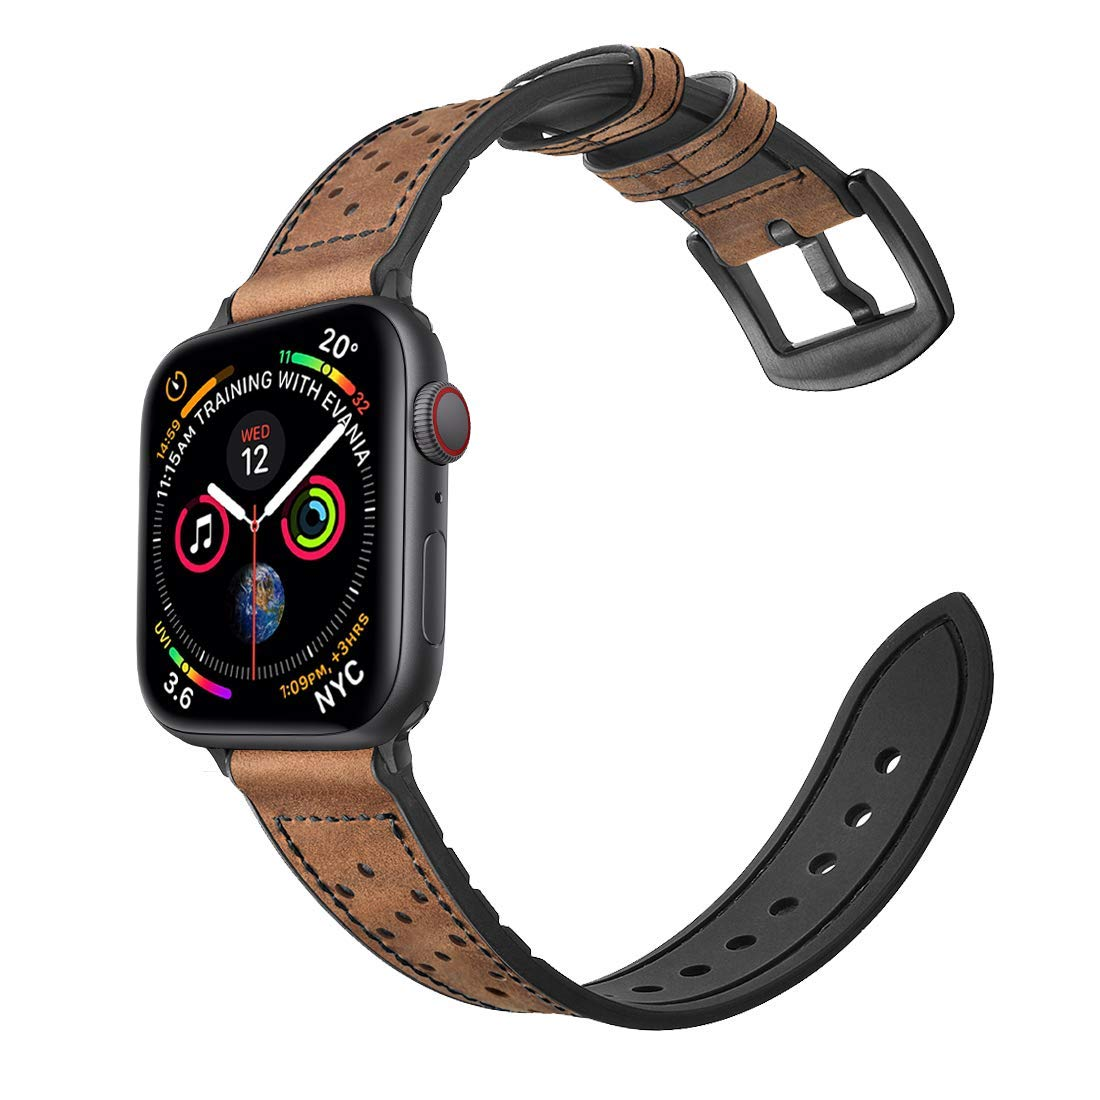 Malla Cuero para Apple Watch (38/40mm) MIFA [7MG2YZKS]